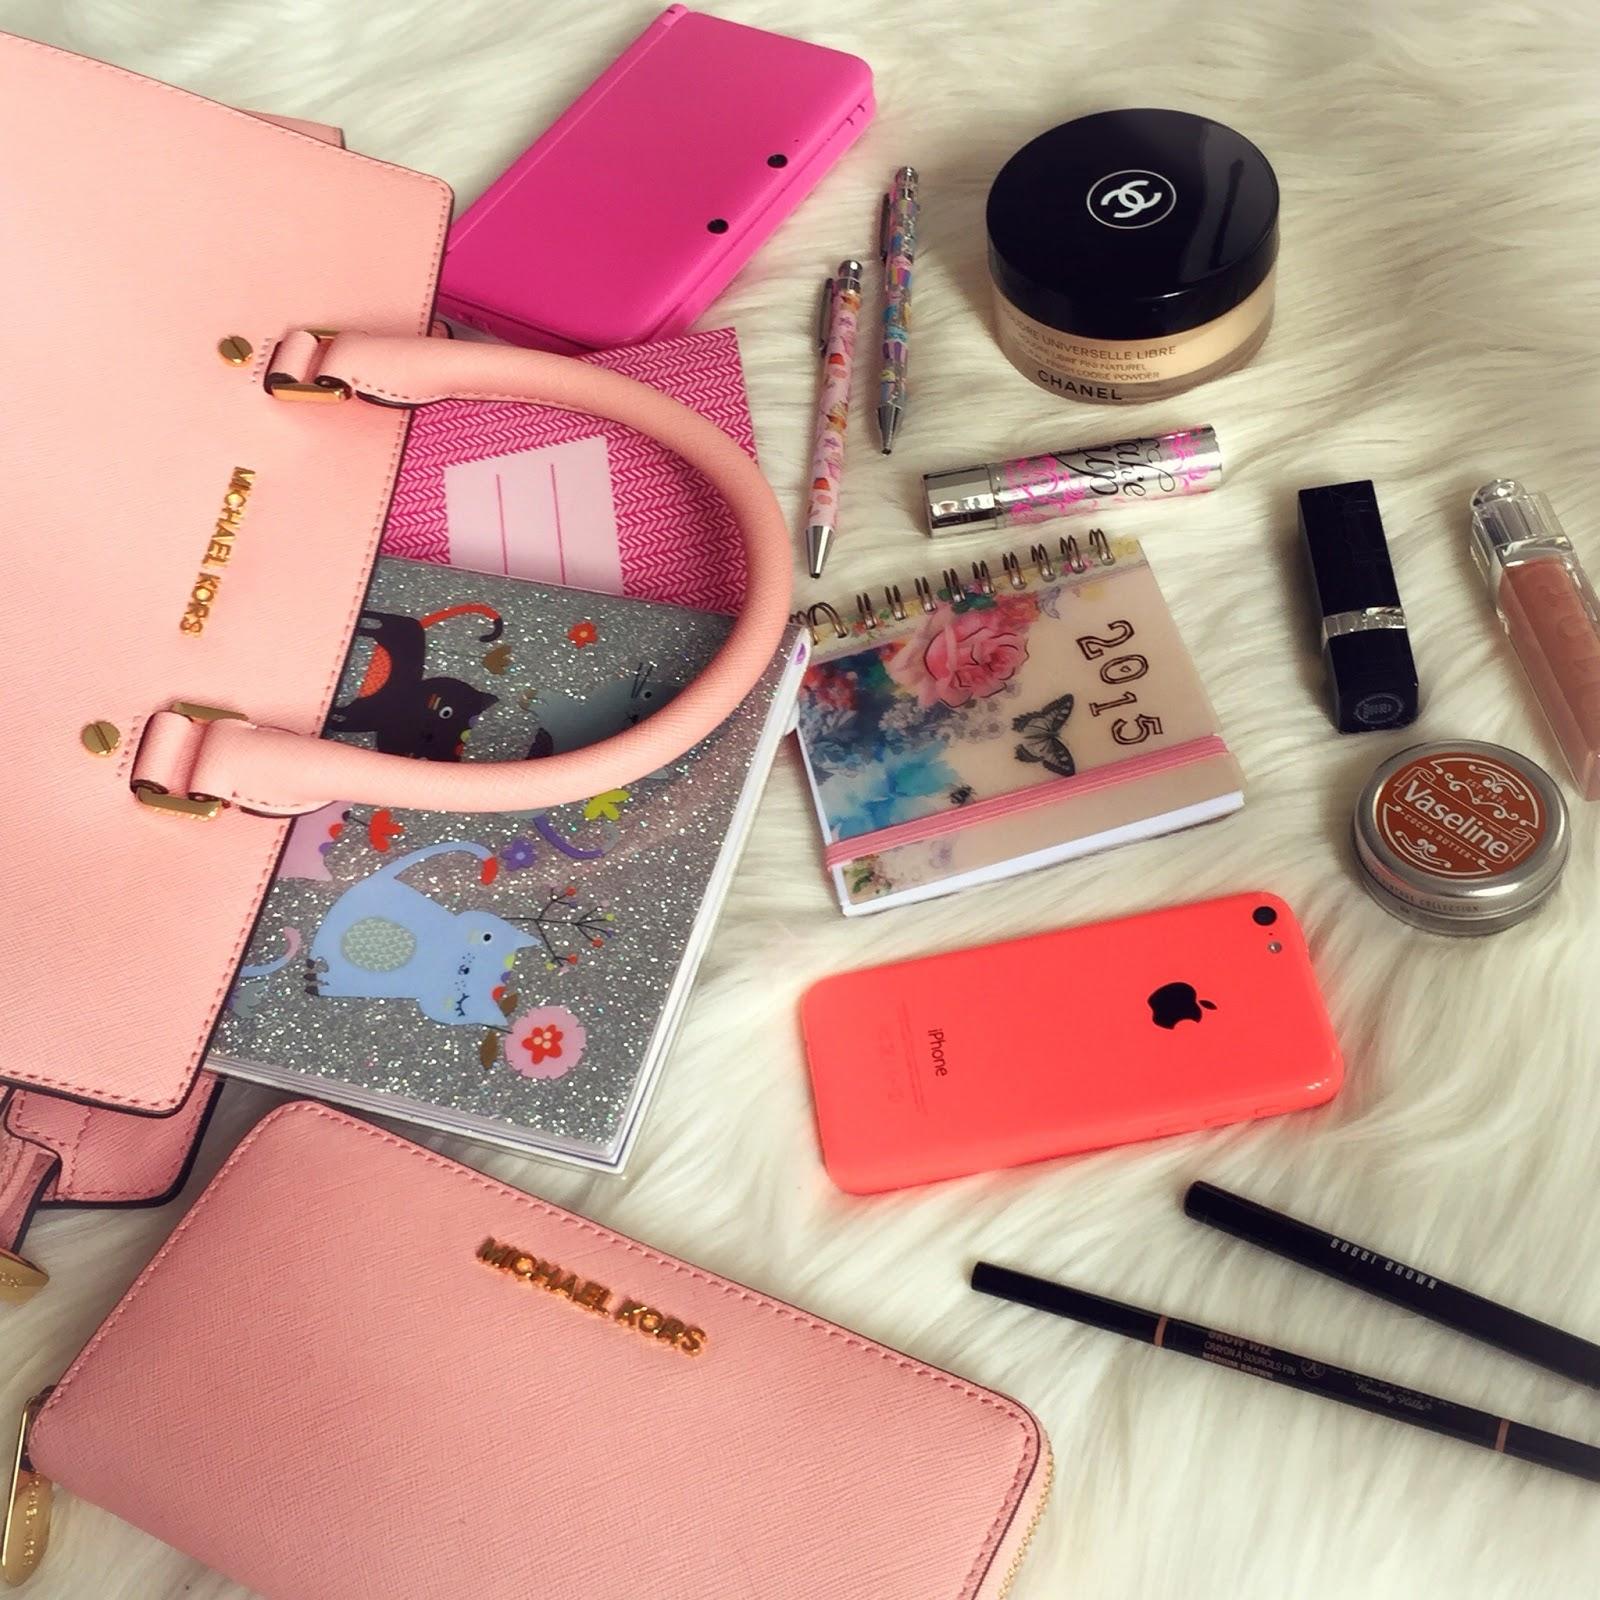 Michael kors bags in dubai - Bag Beige Bag Instagram What S In My Michael Kors Bag